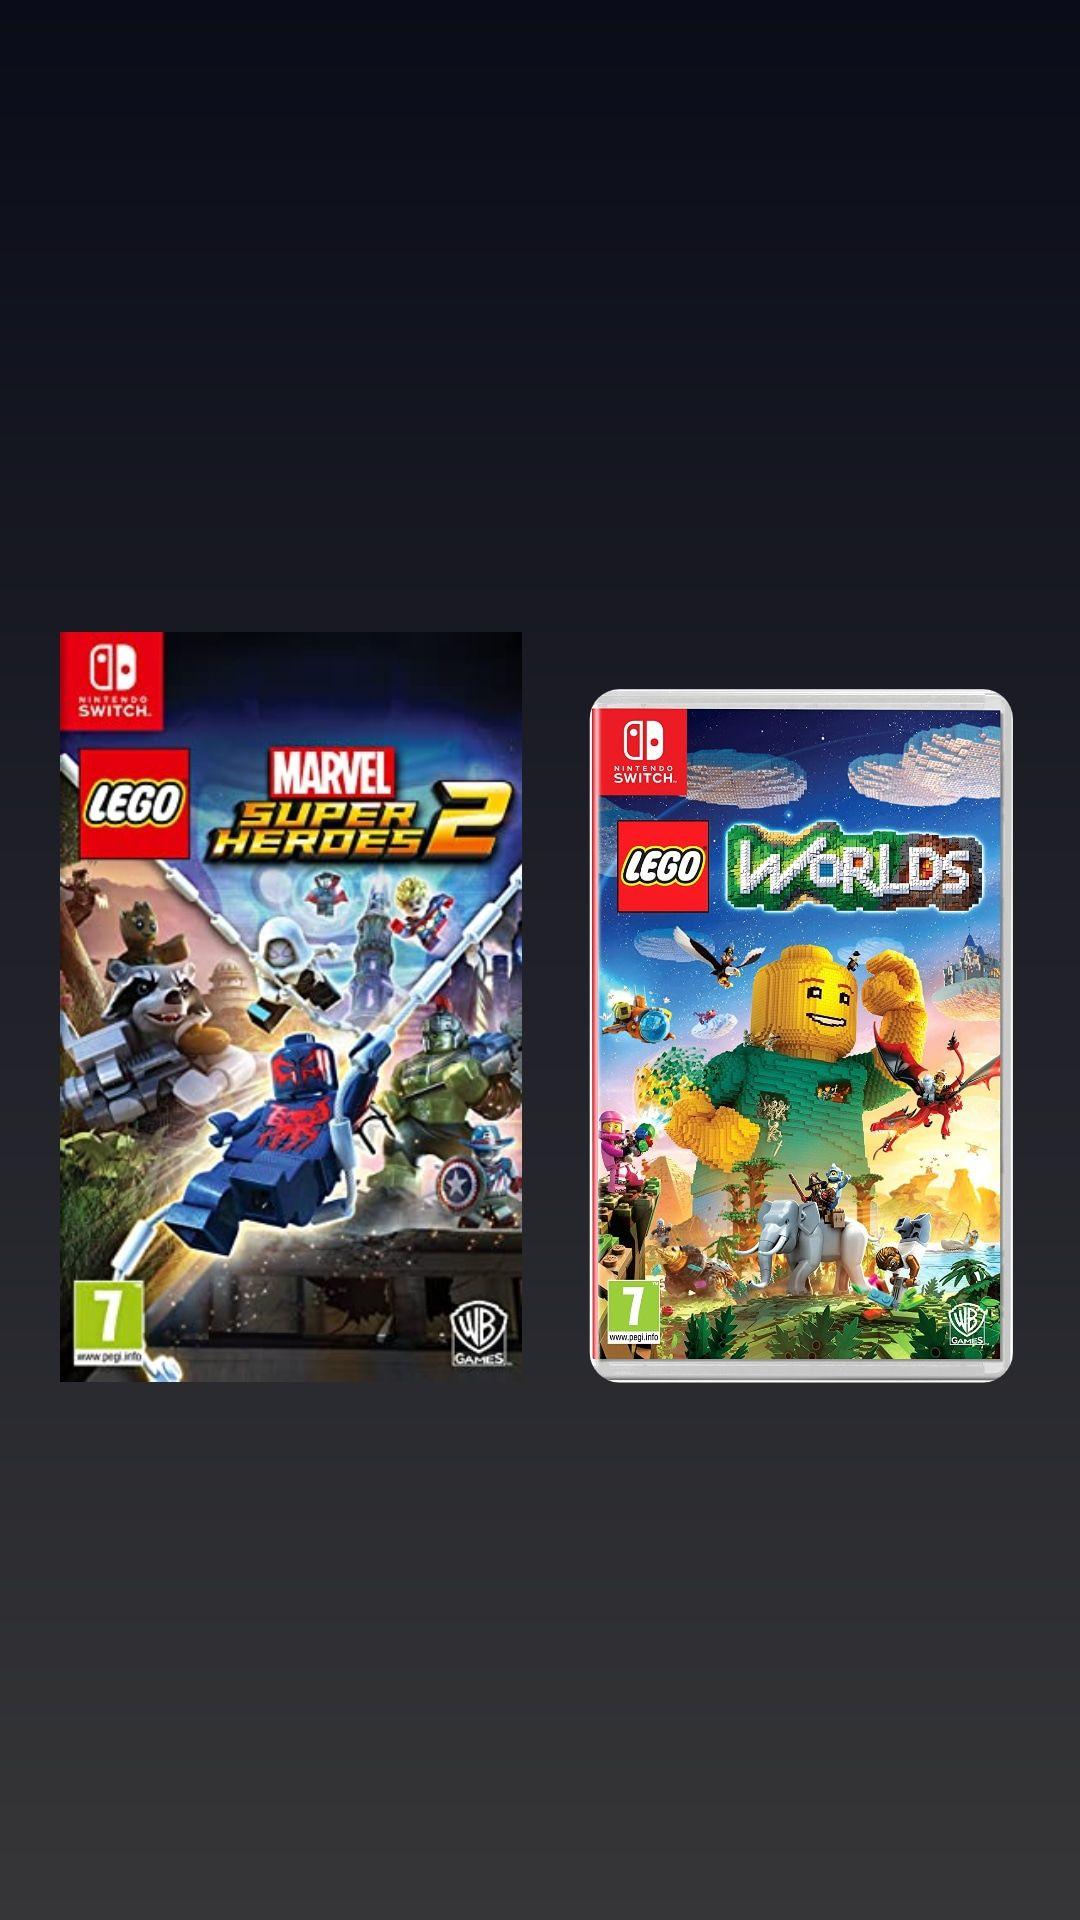 LEGO MARVEL SUPER HEROES 2 (NS) + LEGO WORLDS (NS)